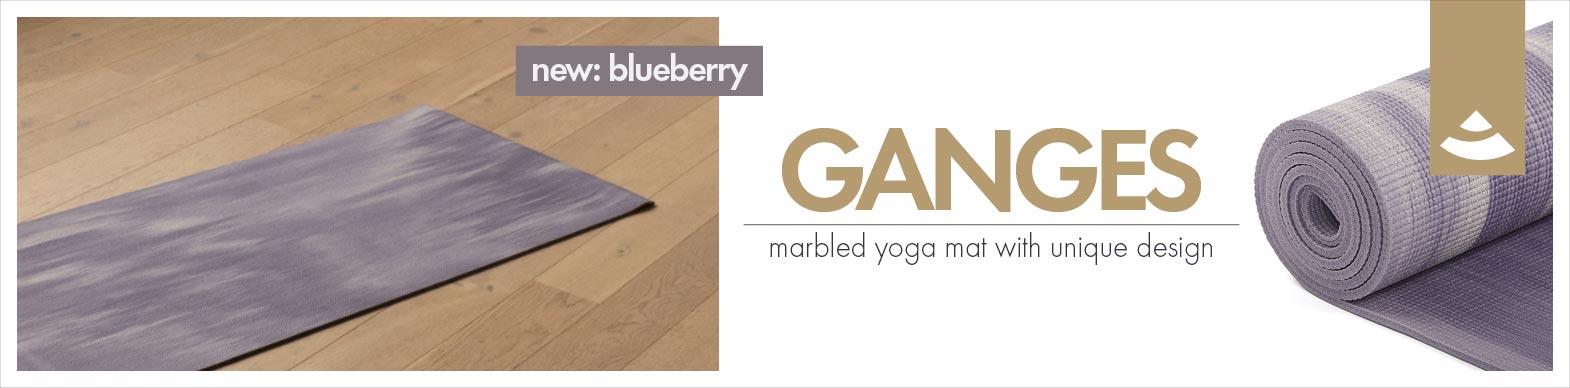 Ganges yoga mat by bodhi